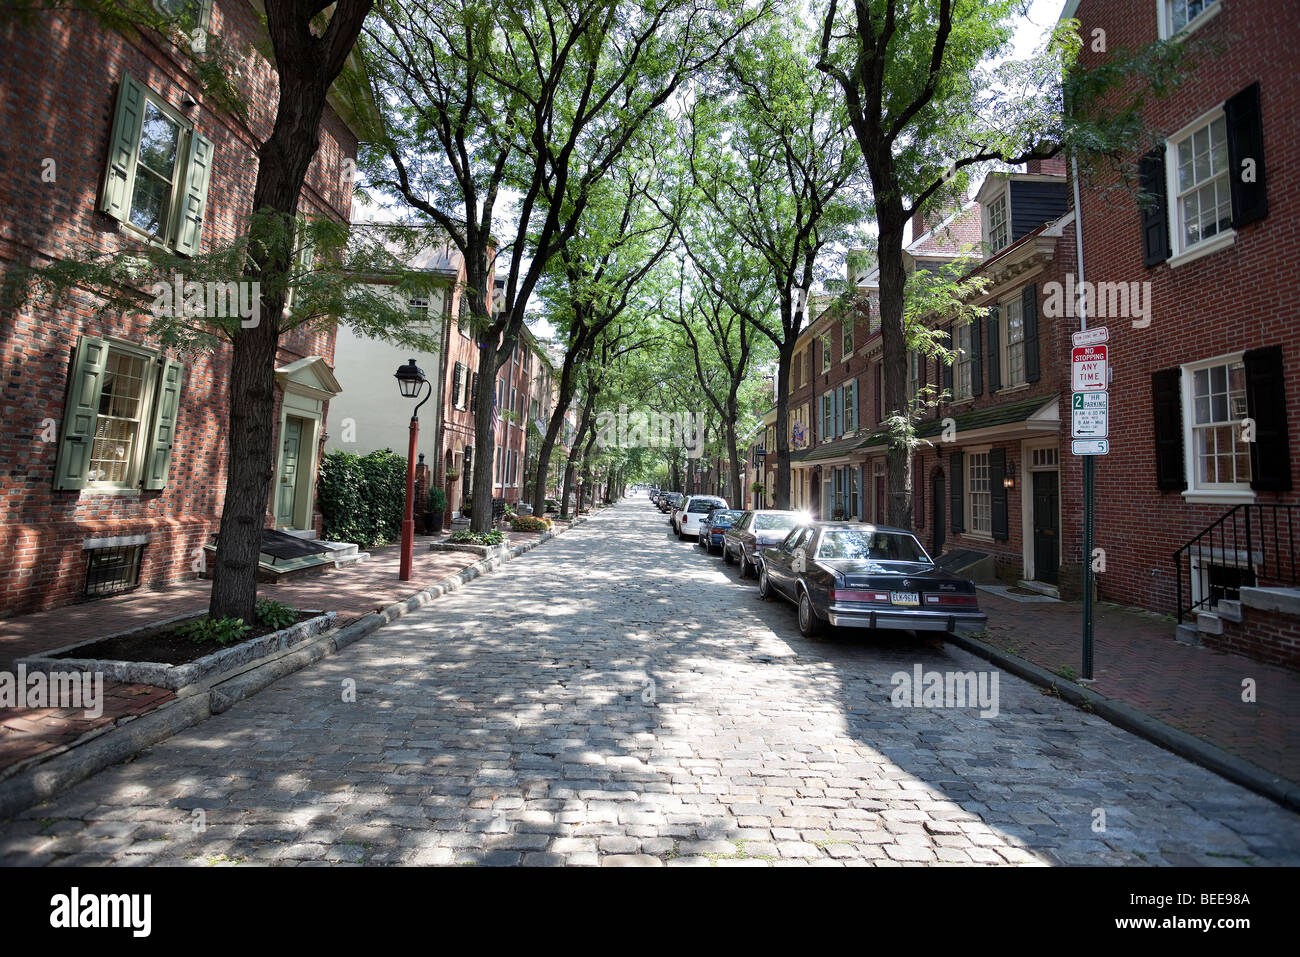 Wohngebiet, Philadelphia, Pennsylvania, PA, USA Stockbild